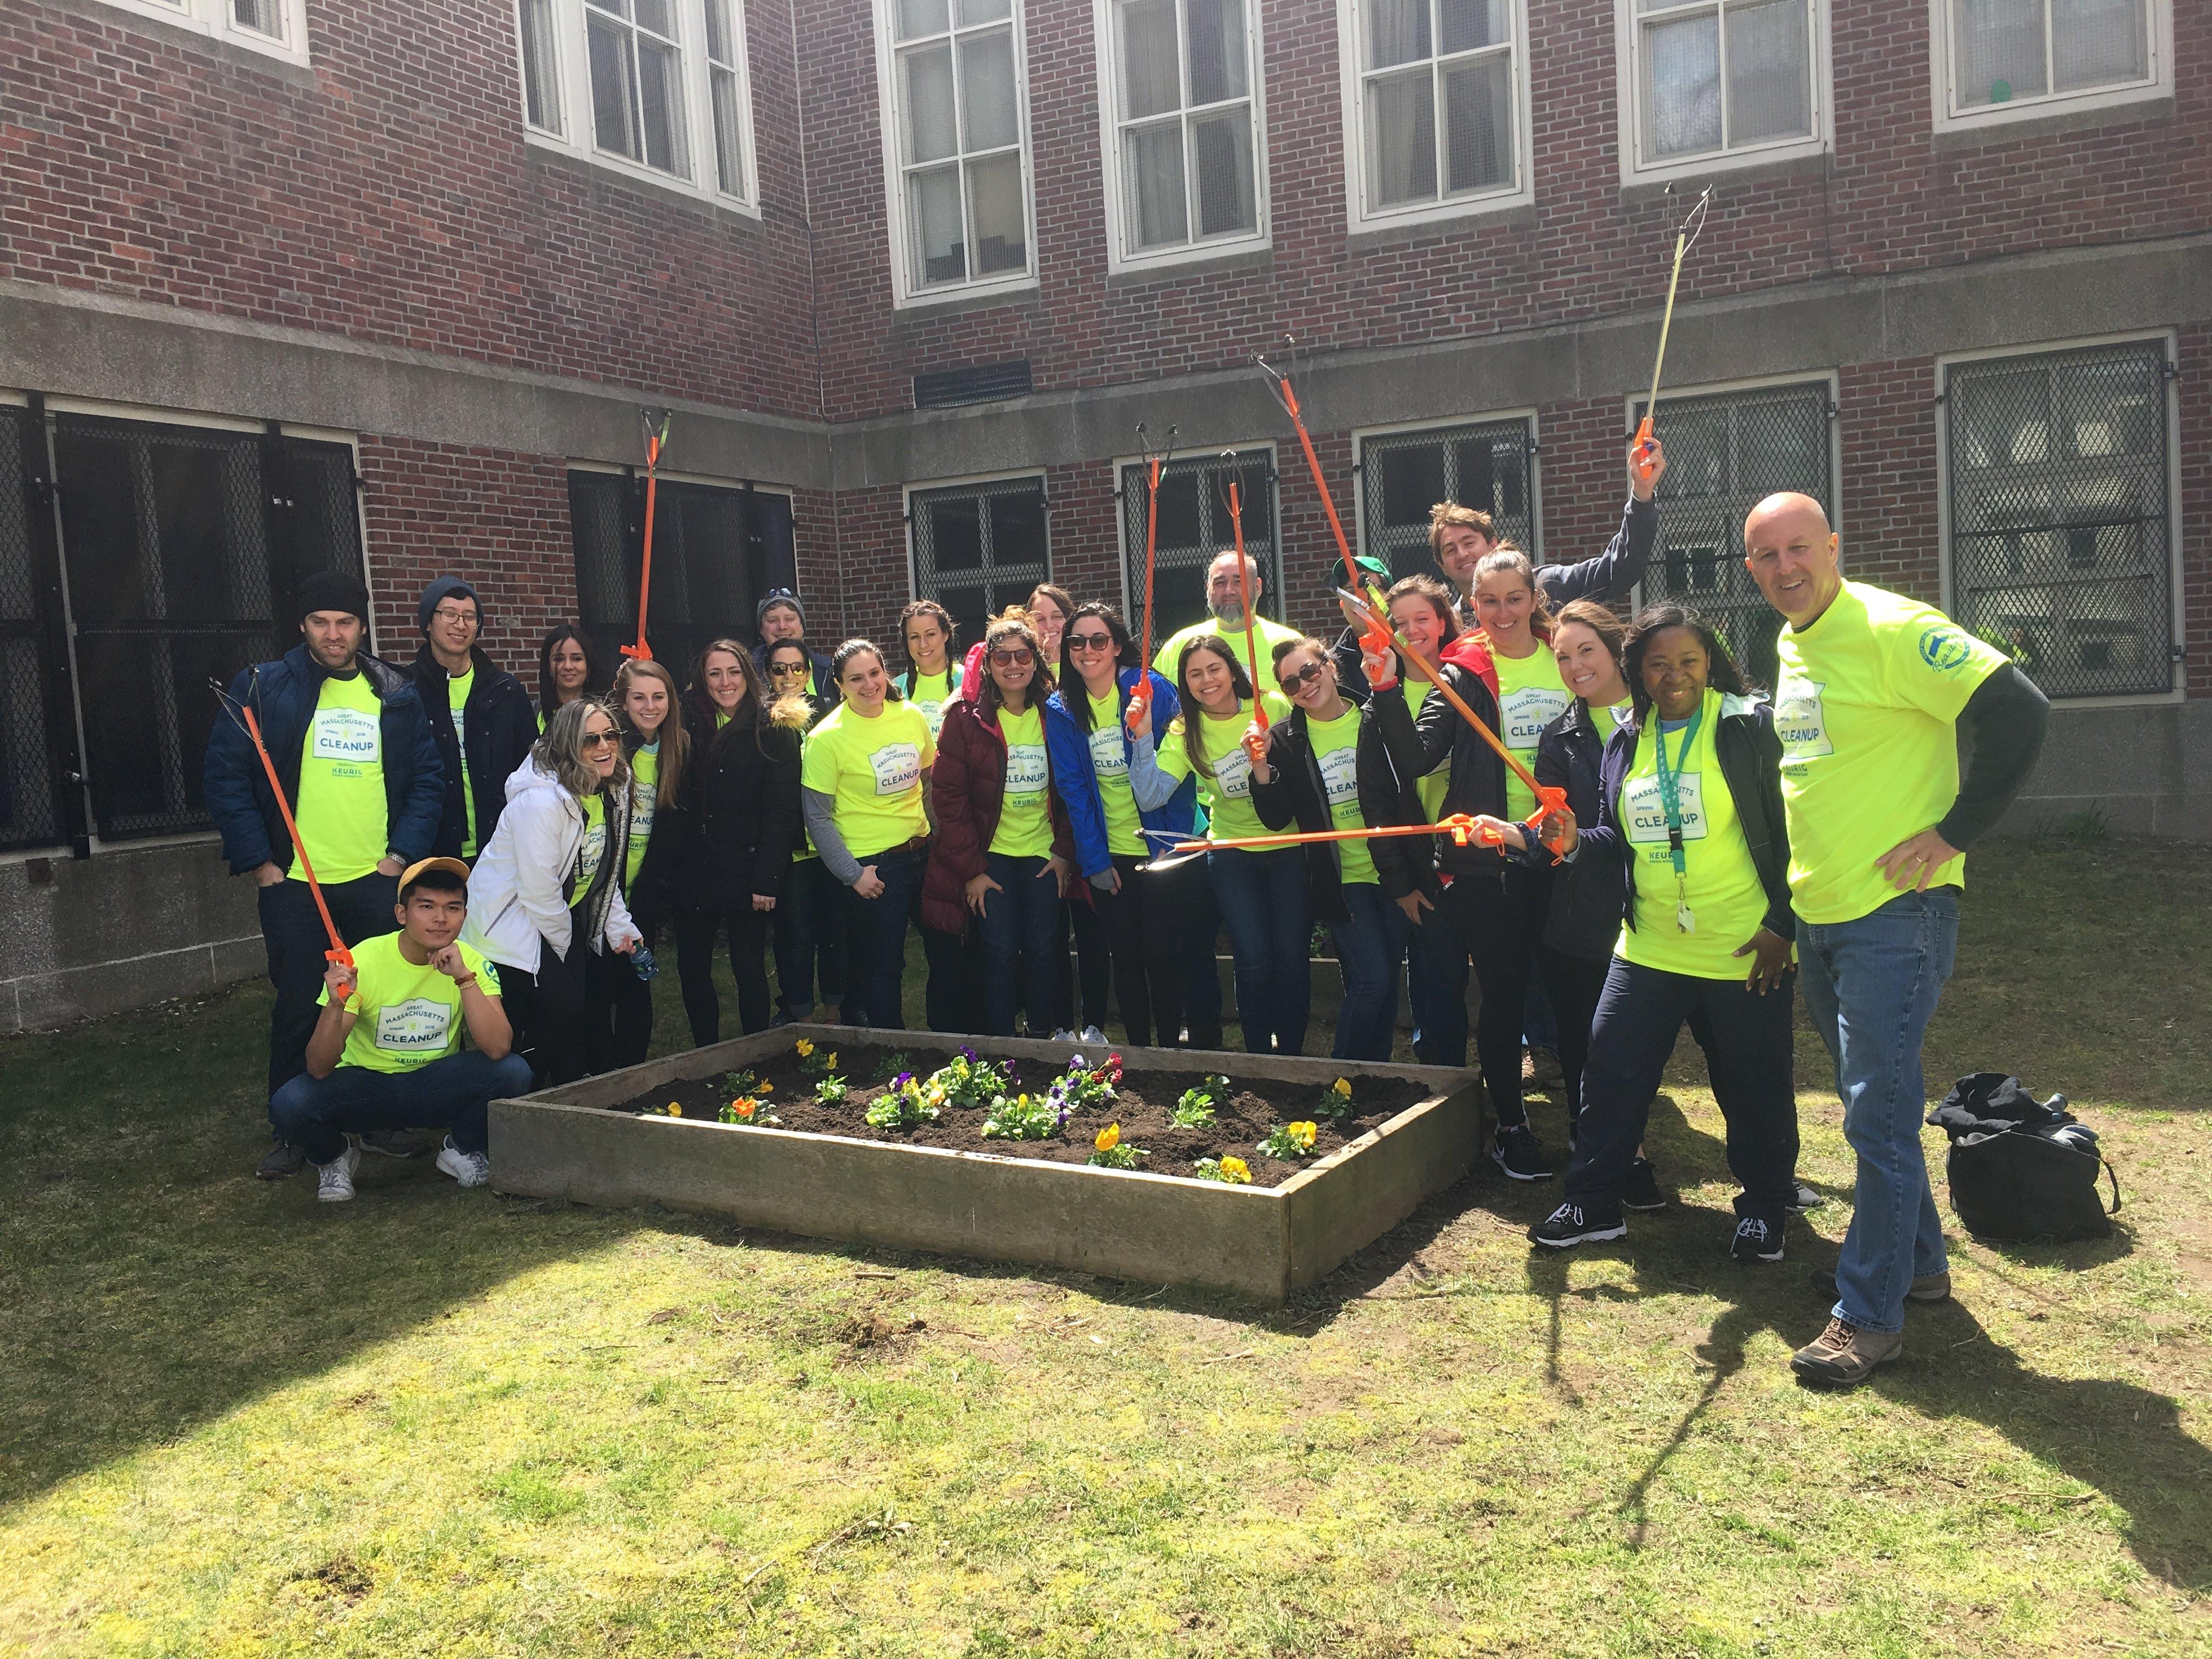 Trip Advisor Volunteers Spruce Up Dorchester School